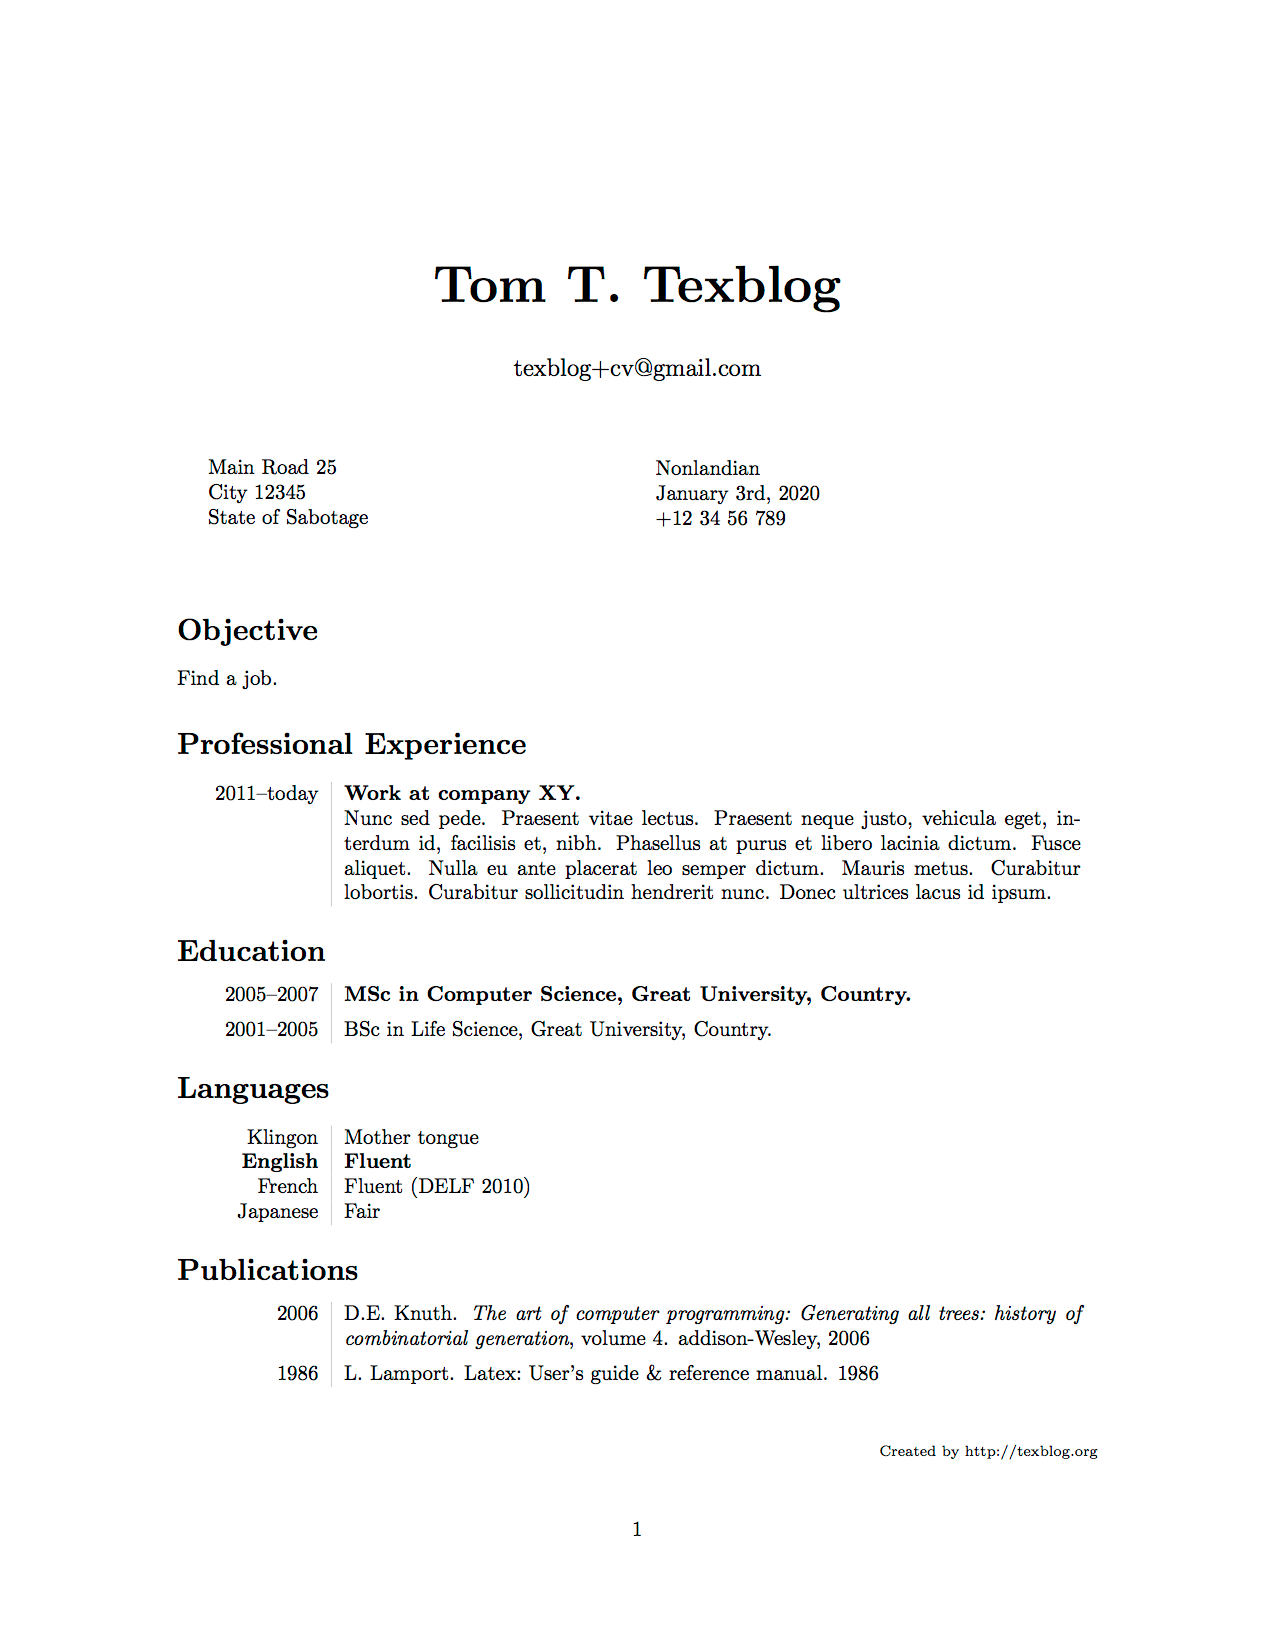 Writing a CV in LaTeX – texblog